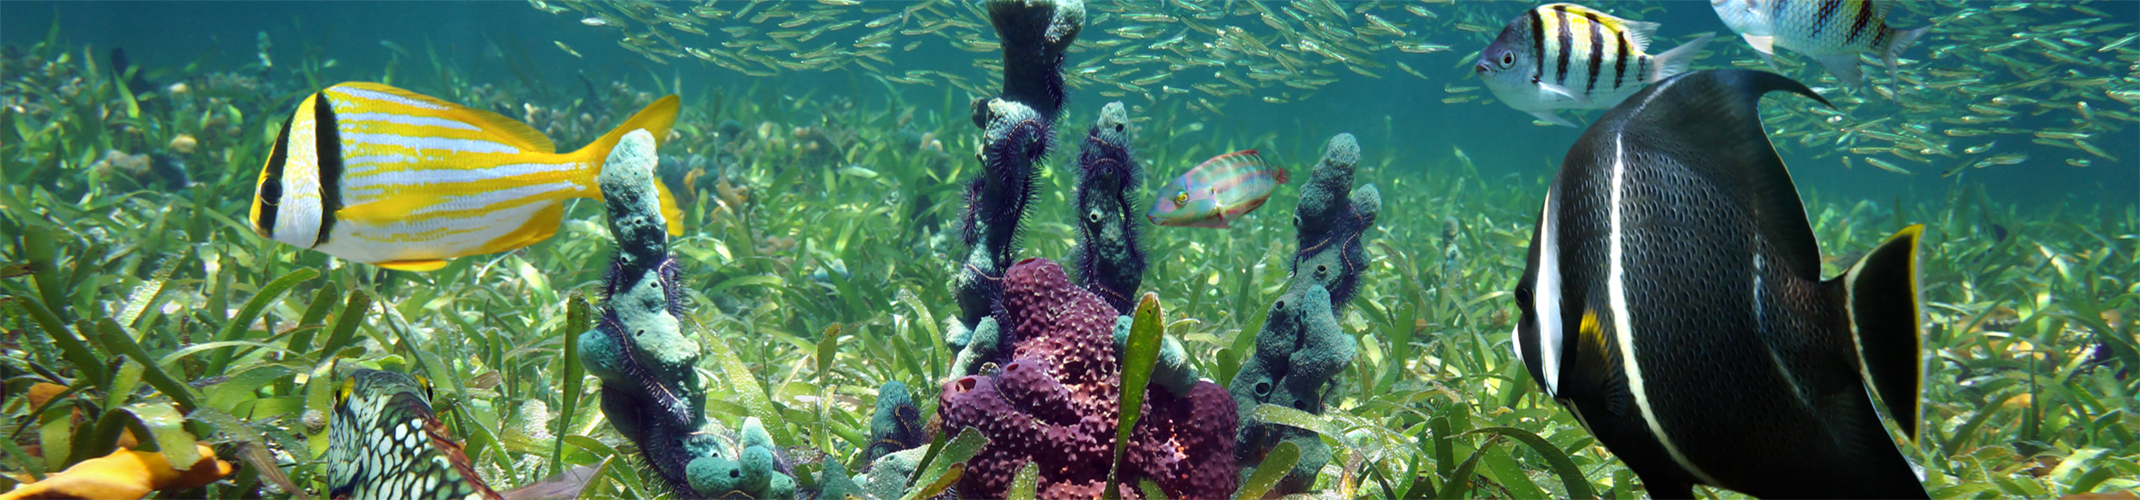 Best Diving in the Florida Keys